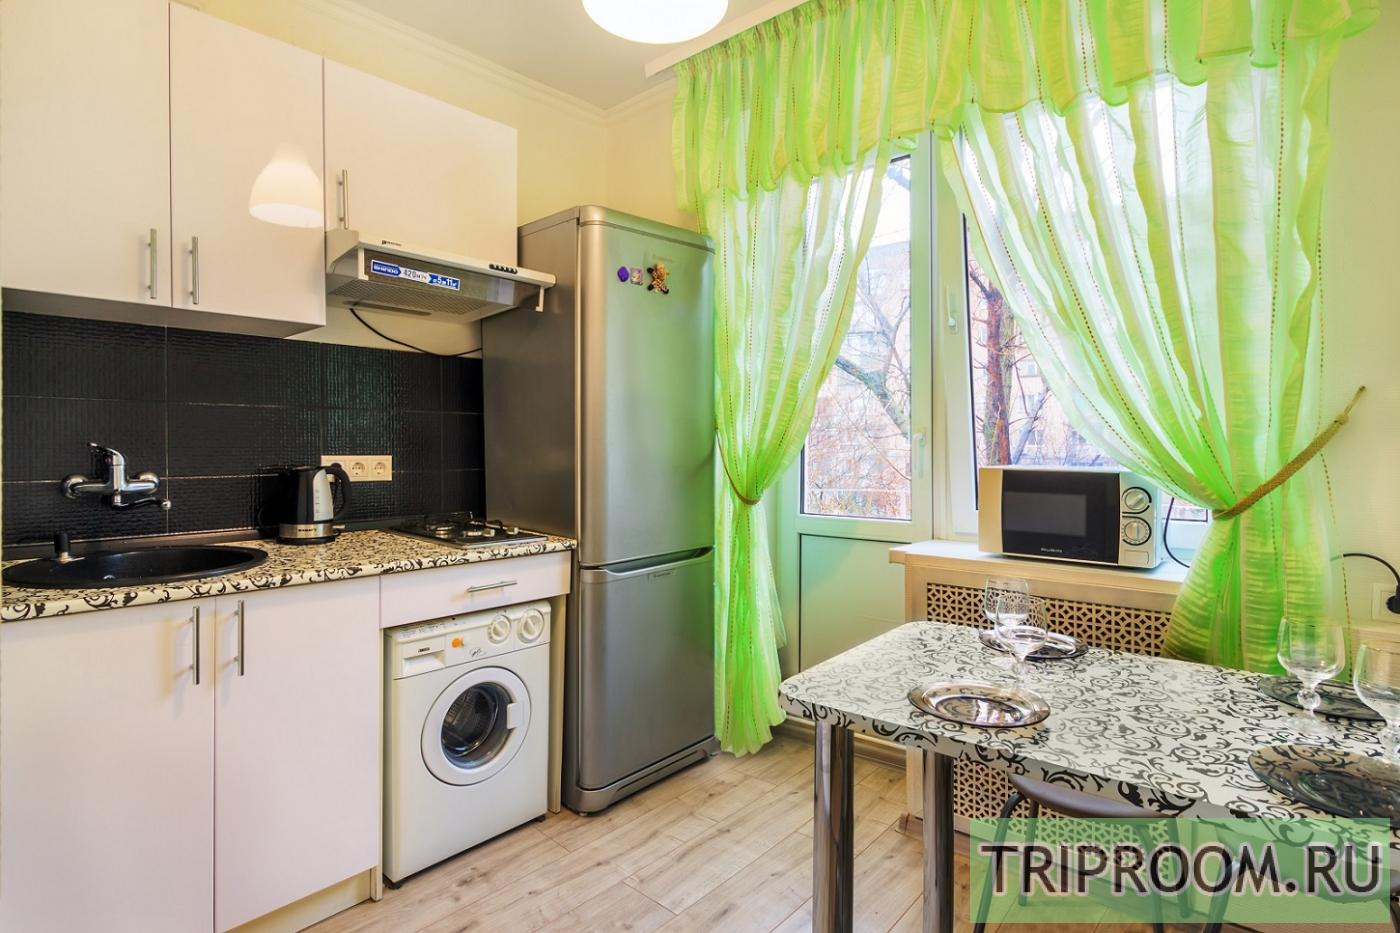 2-комнатная квартира посуточно (вариант № 11539), ул. Семашко переулок, фото № 5